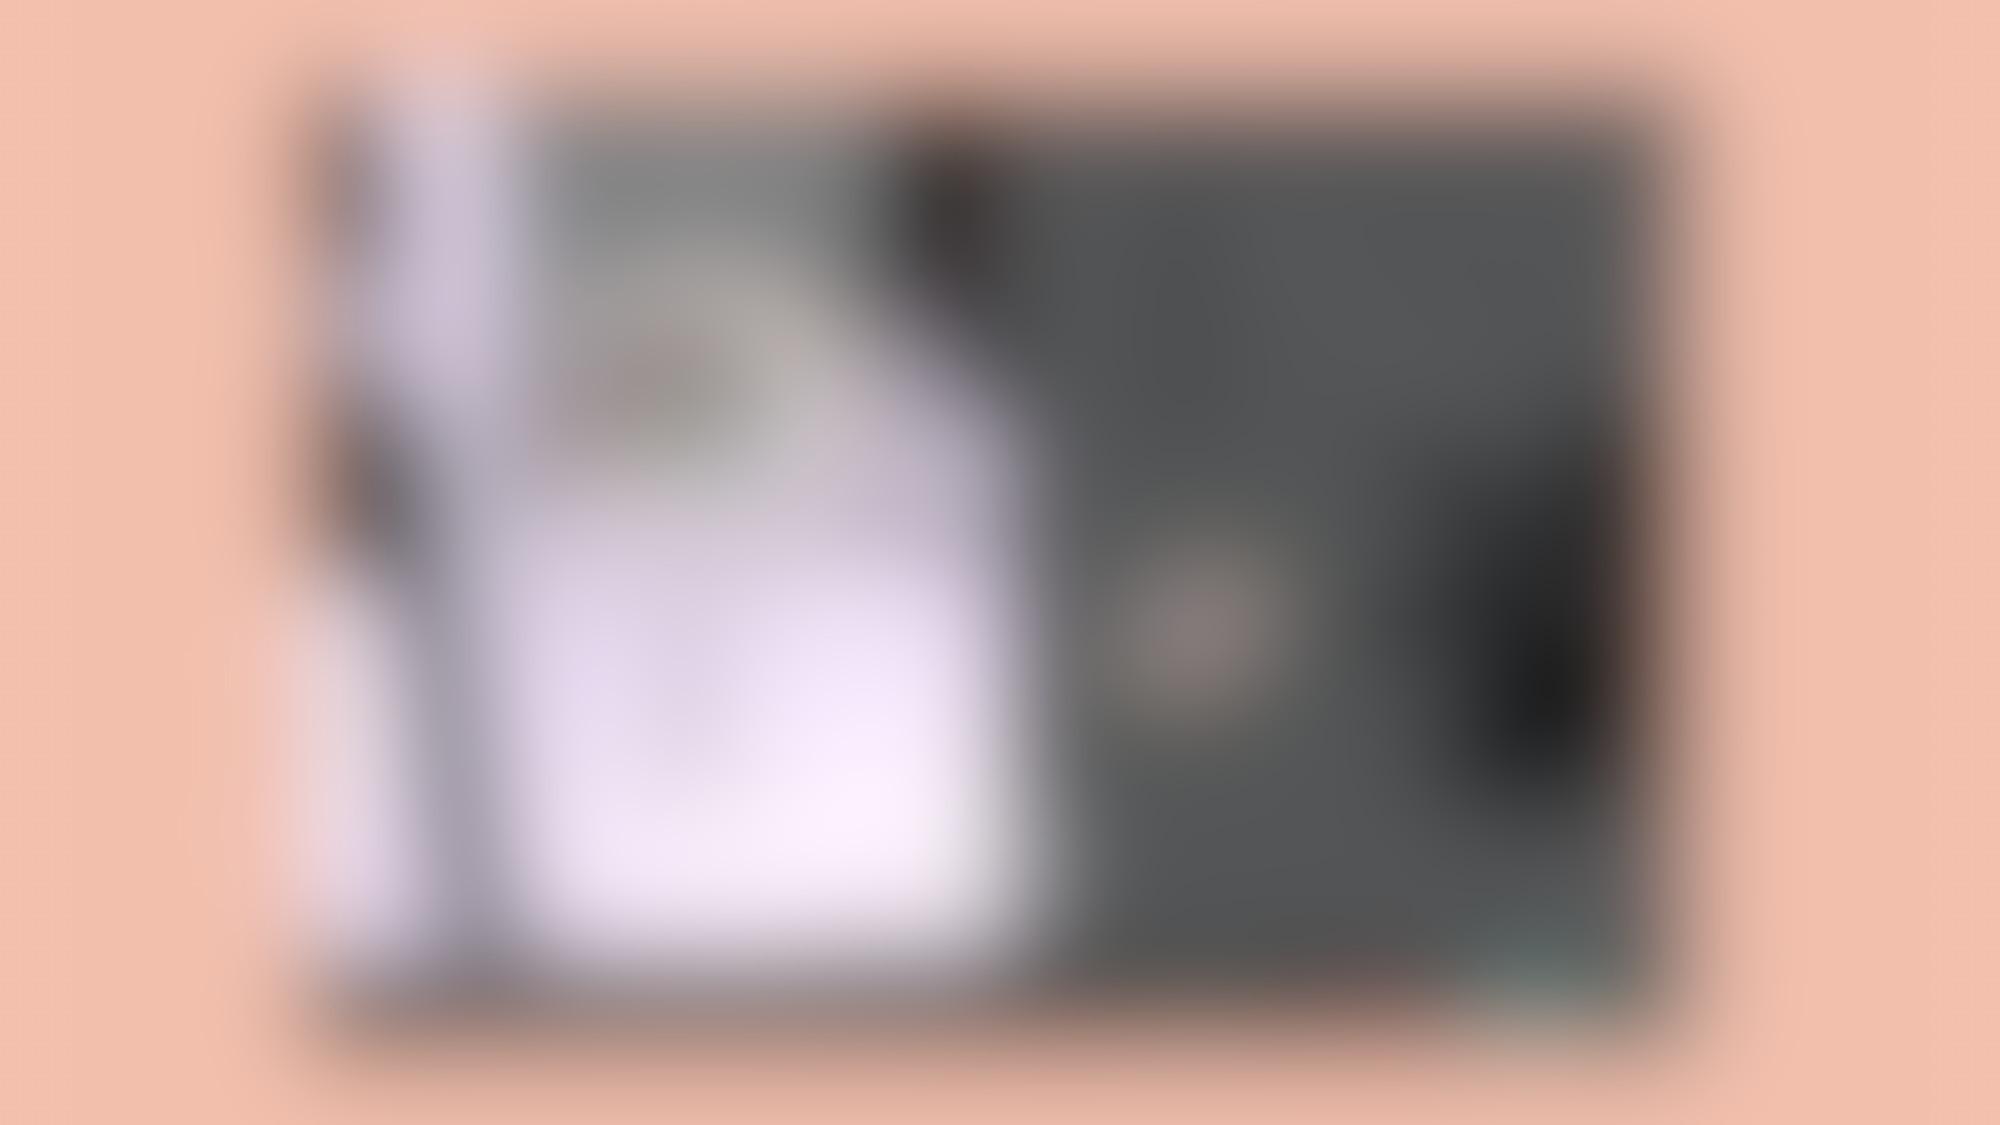 7 1 autocompressfitresizeixlibphp 1 1 0max h2000max w3 D2000q80s8ce1a2832b19388b3ce346e86b0a3238